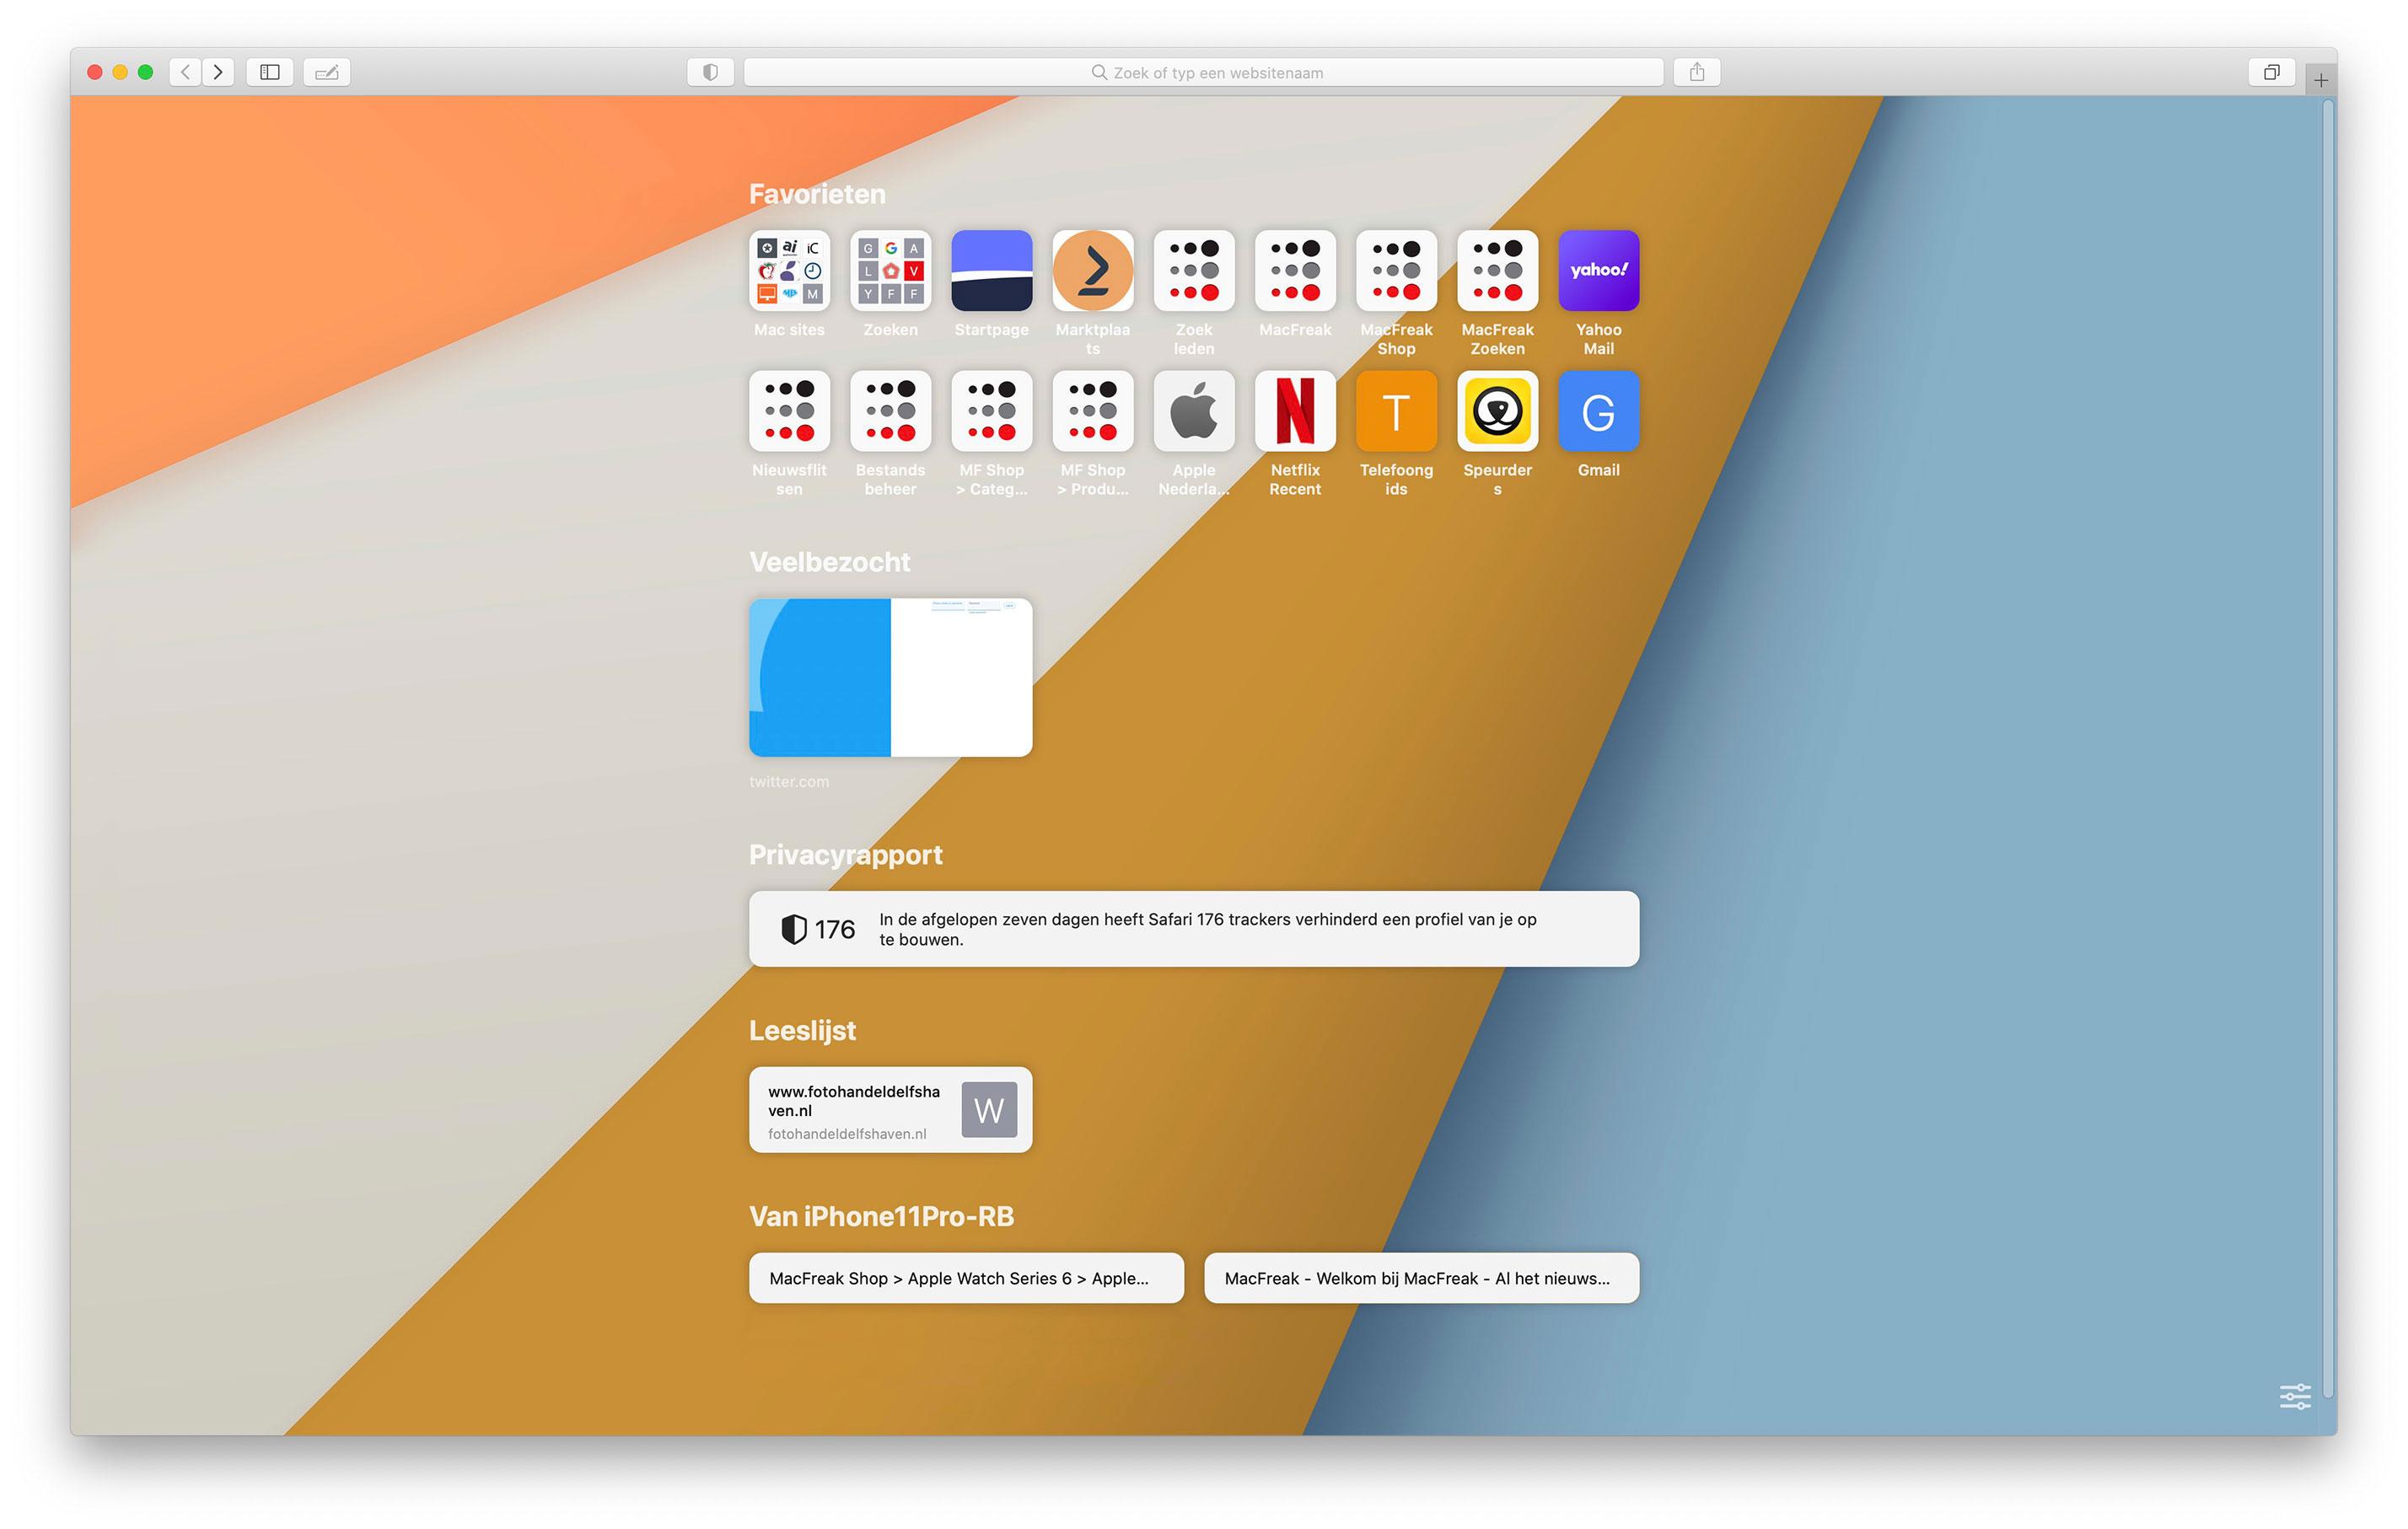 https://www.macfreak.nl/modules/news/images/zArt.macOS-Safari14WallpaperToevoegenTip-3.jpg